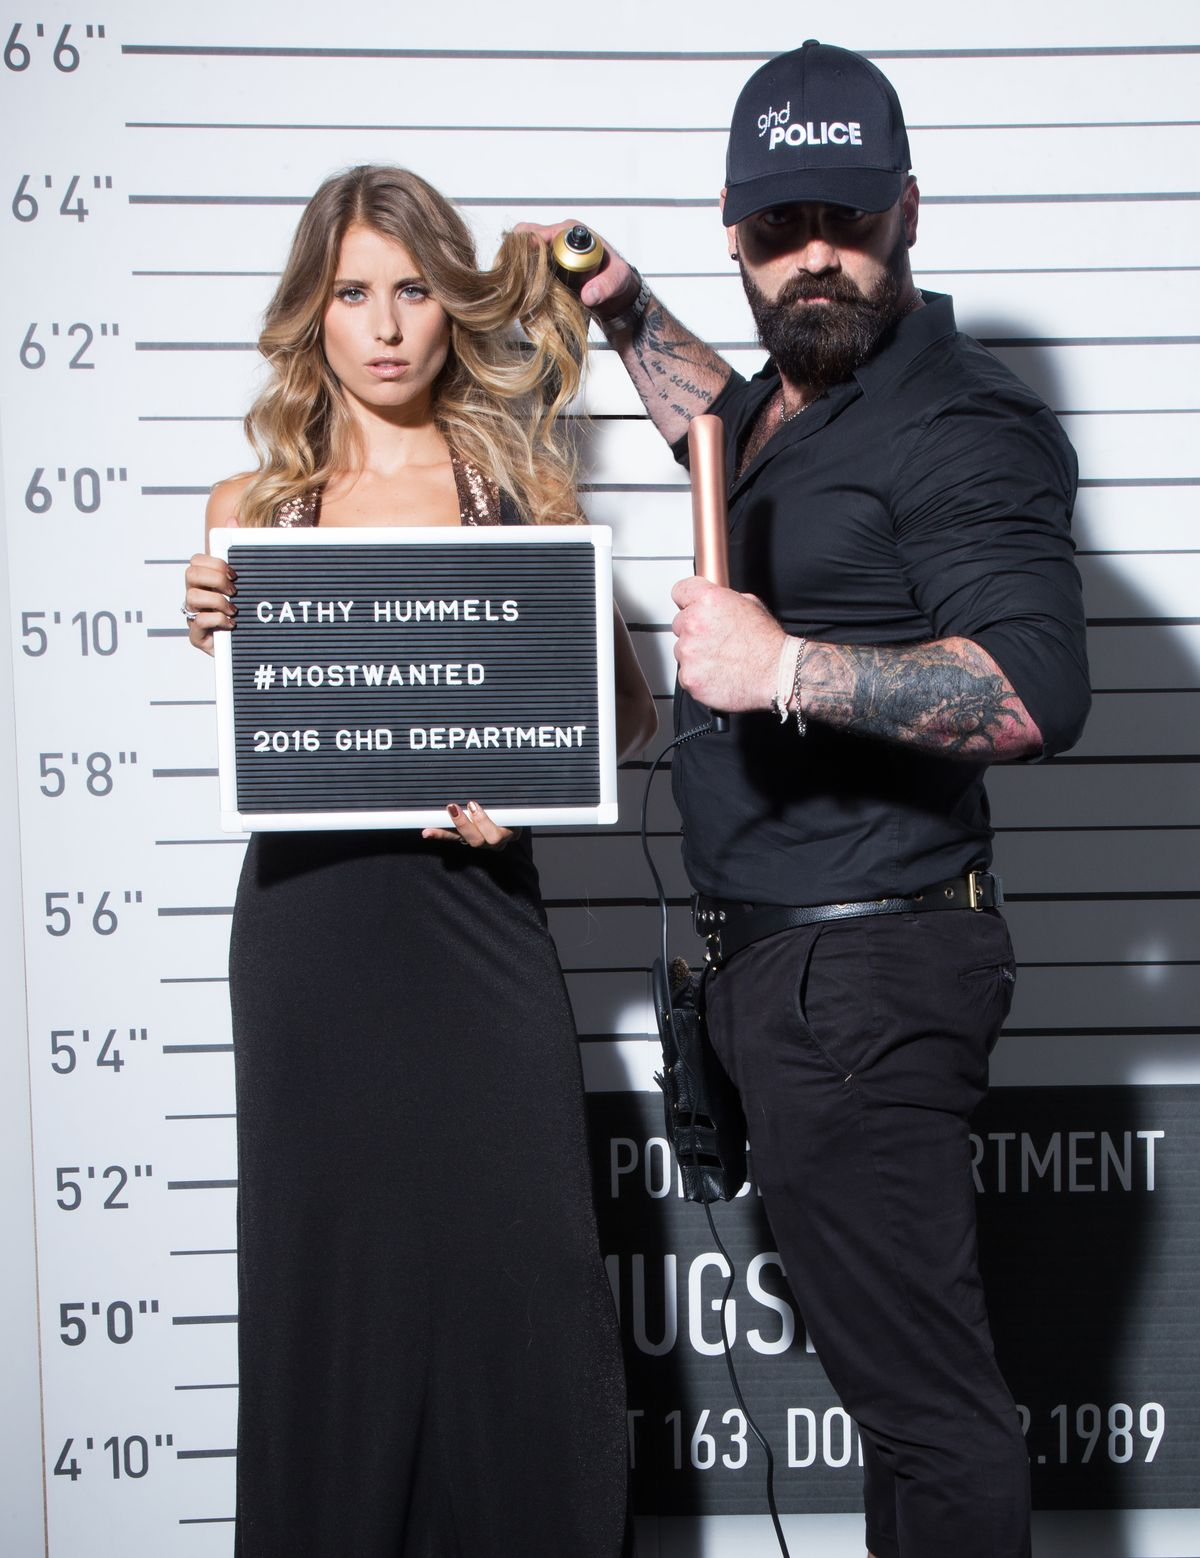 Cathy Hummels, Mr. Policeman